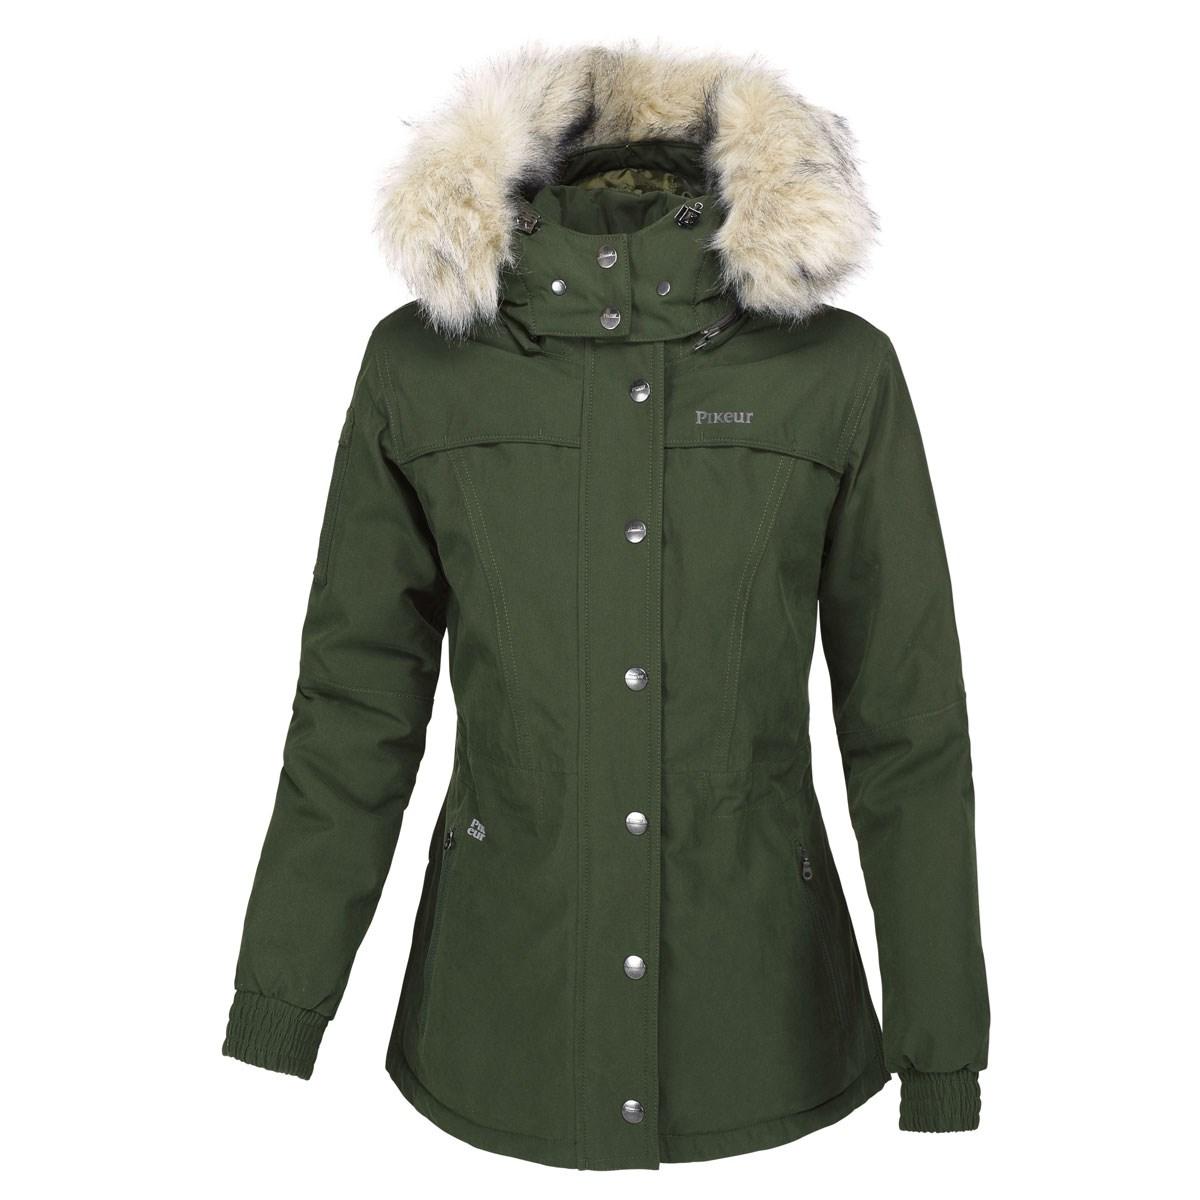 688c920aa24 Pikeur Dea Ladies Waterproof Short Parka Jacket - Pine Green